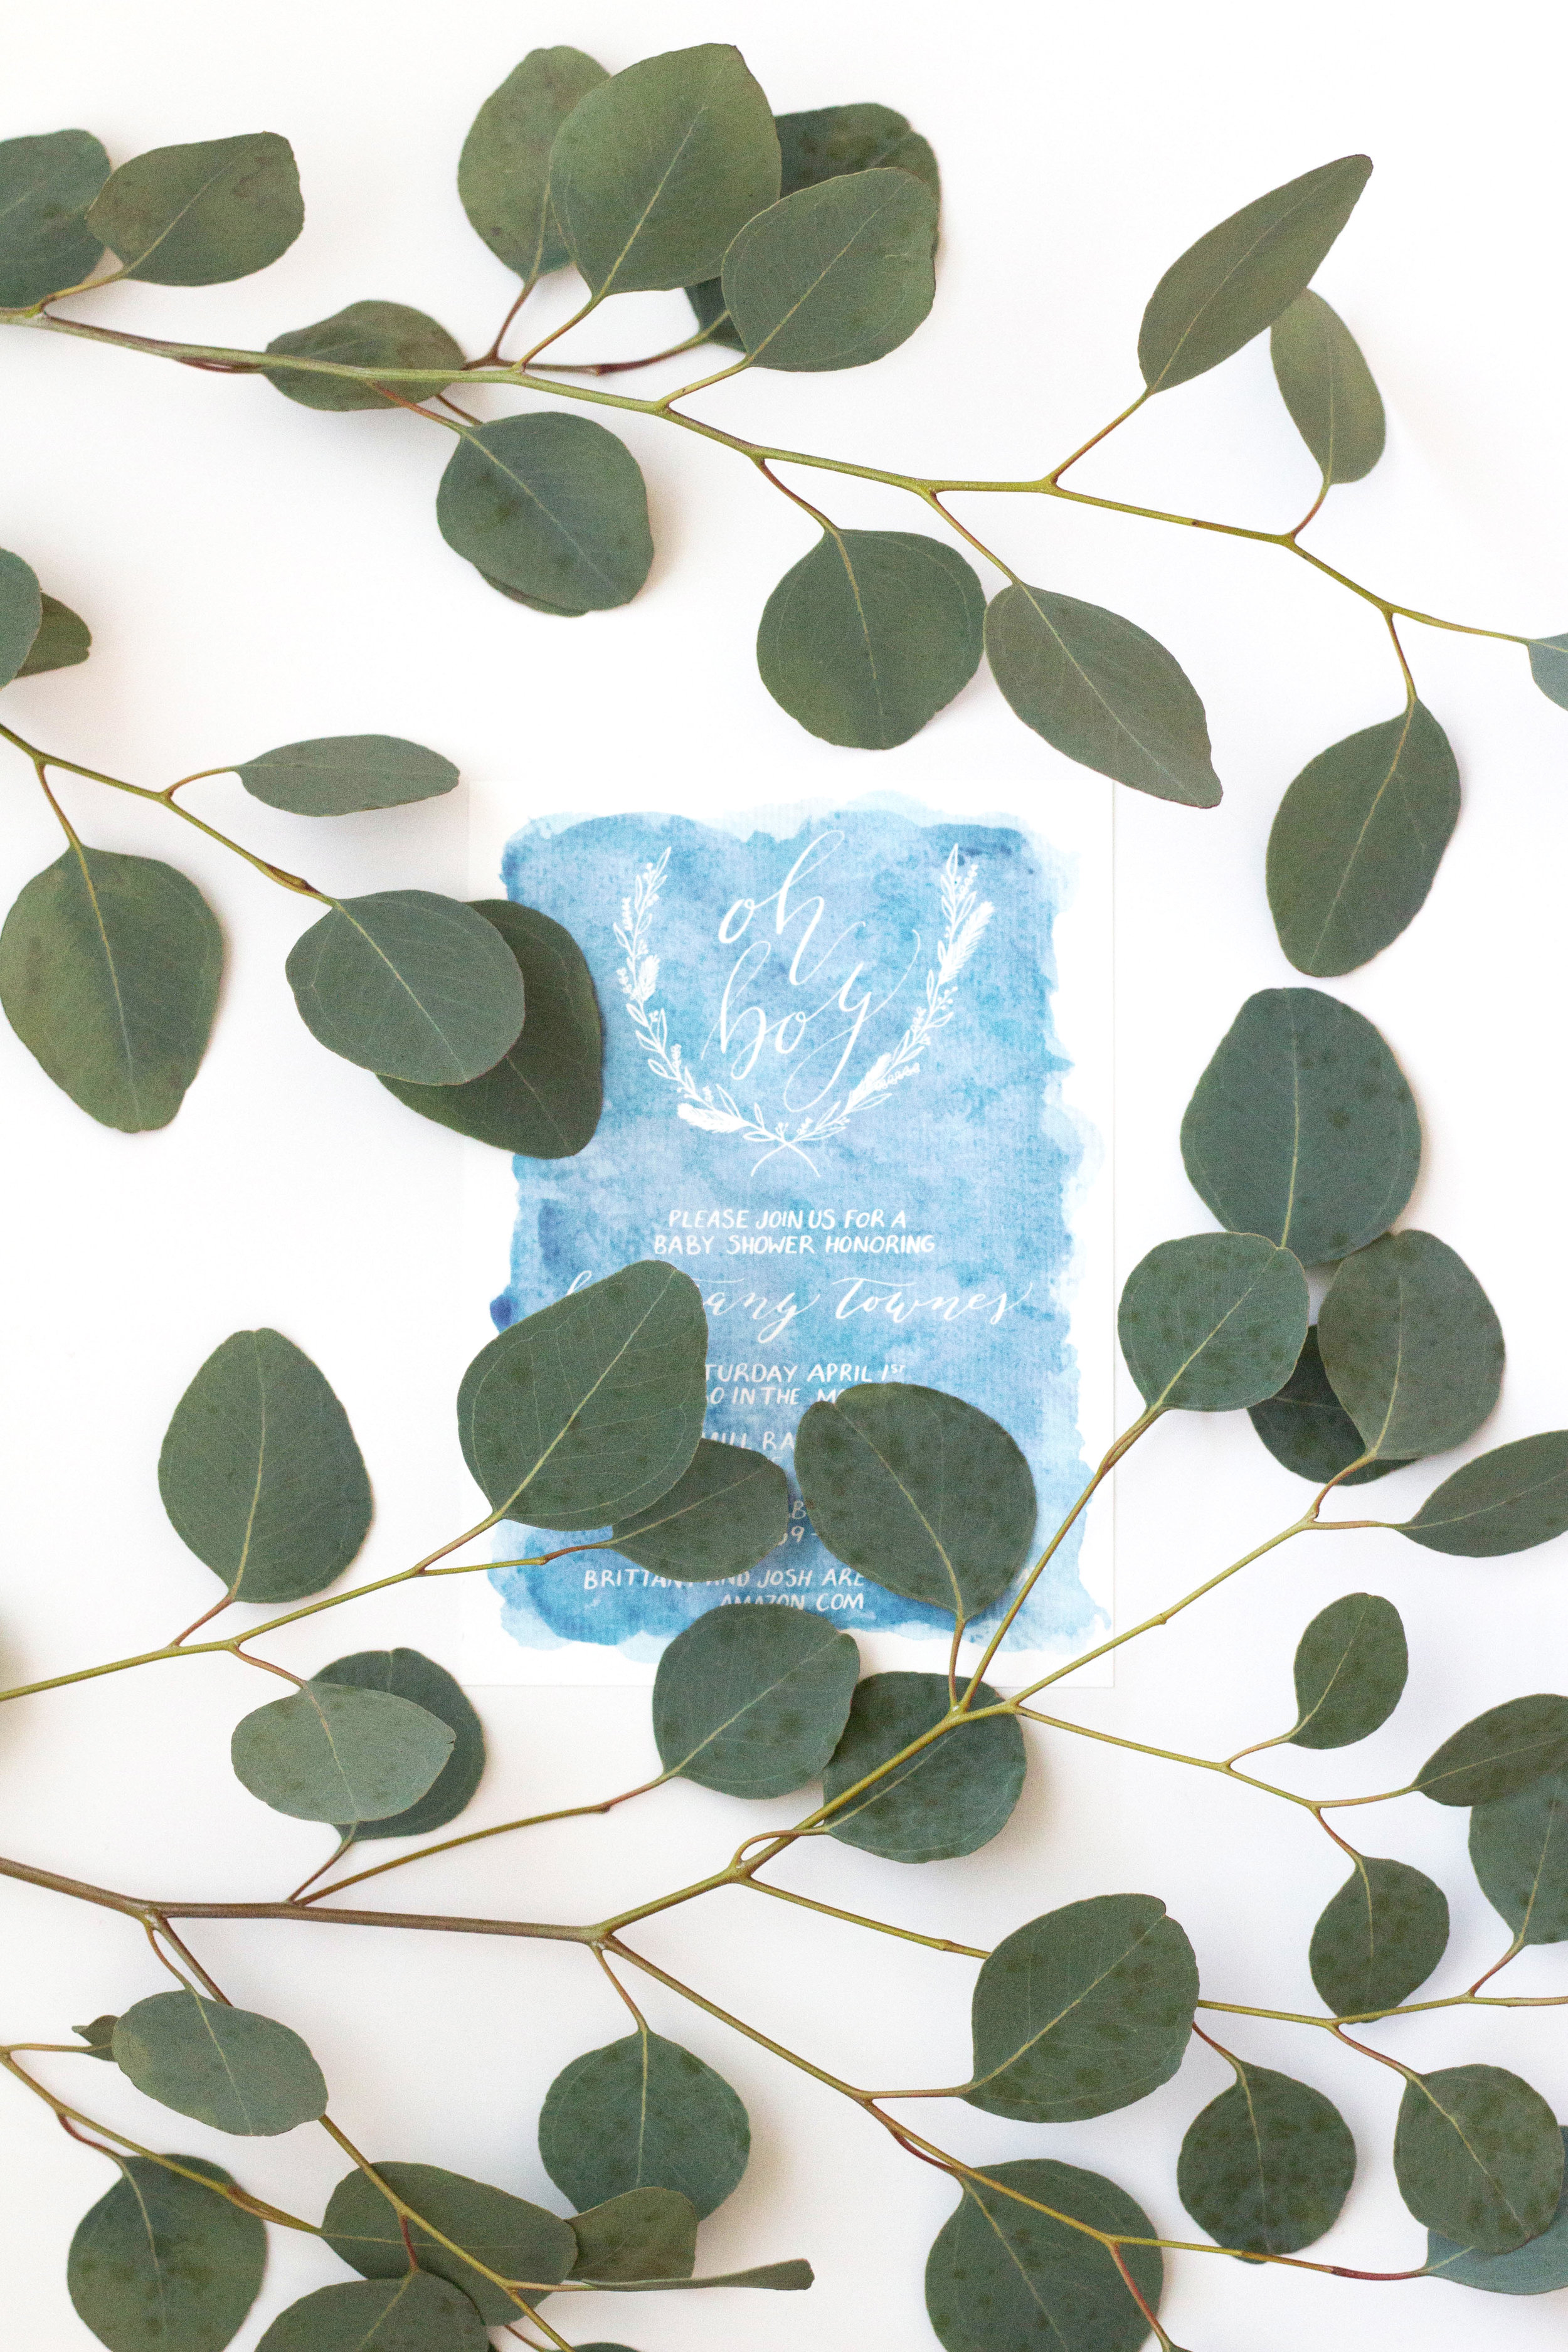 Invitation featuring watercolor & modern calligraphy    True North Paper Co.